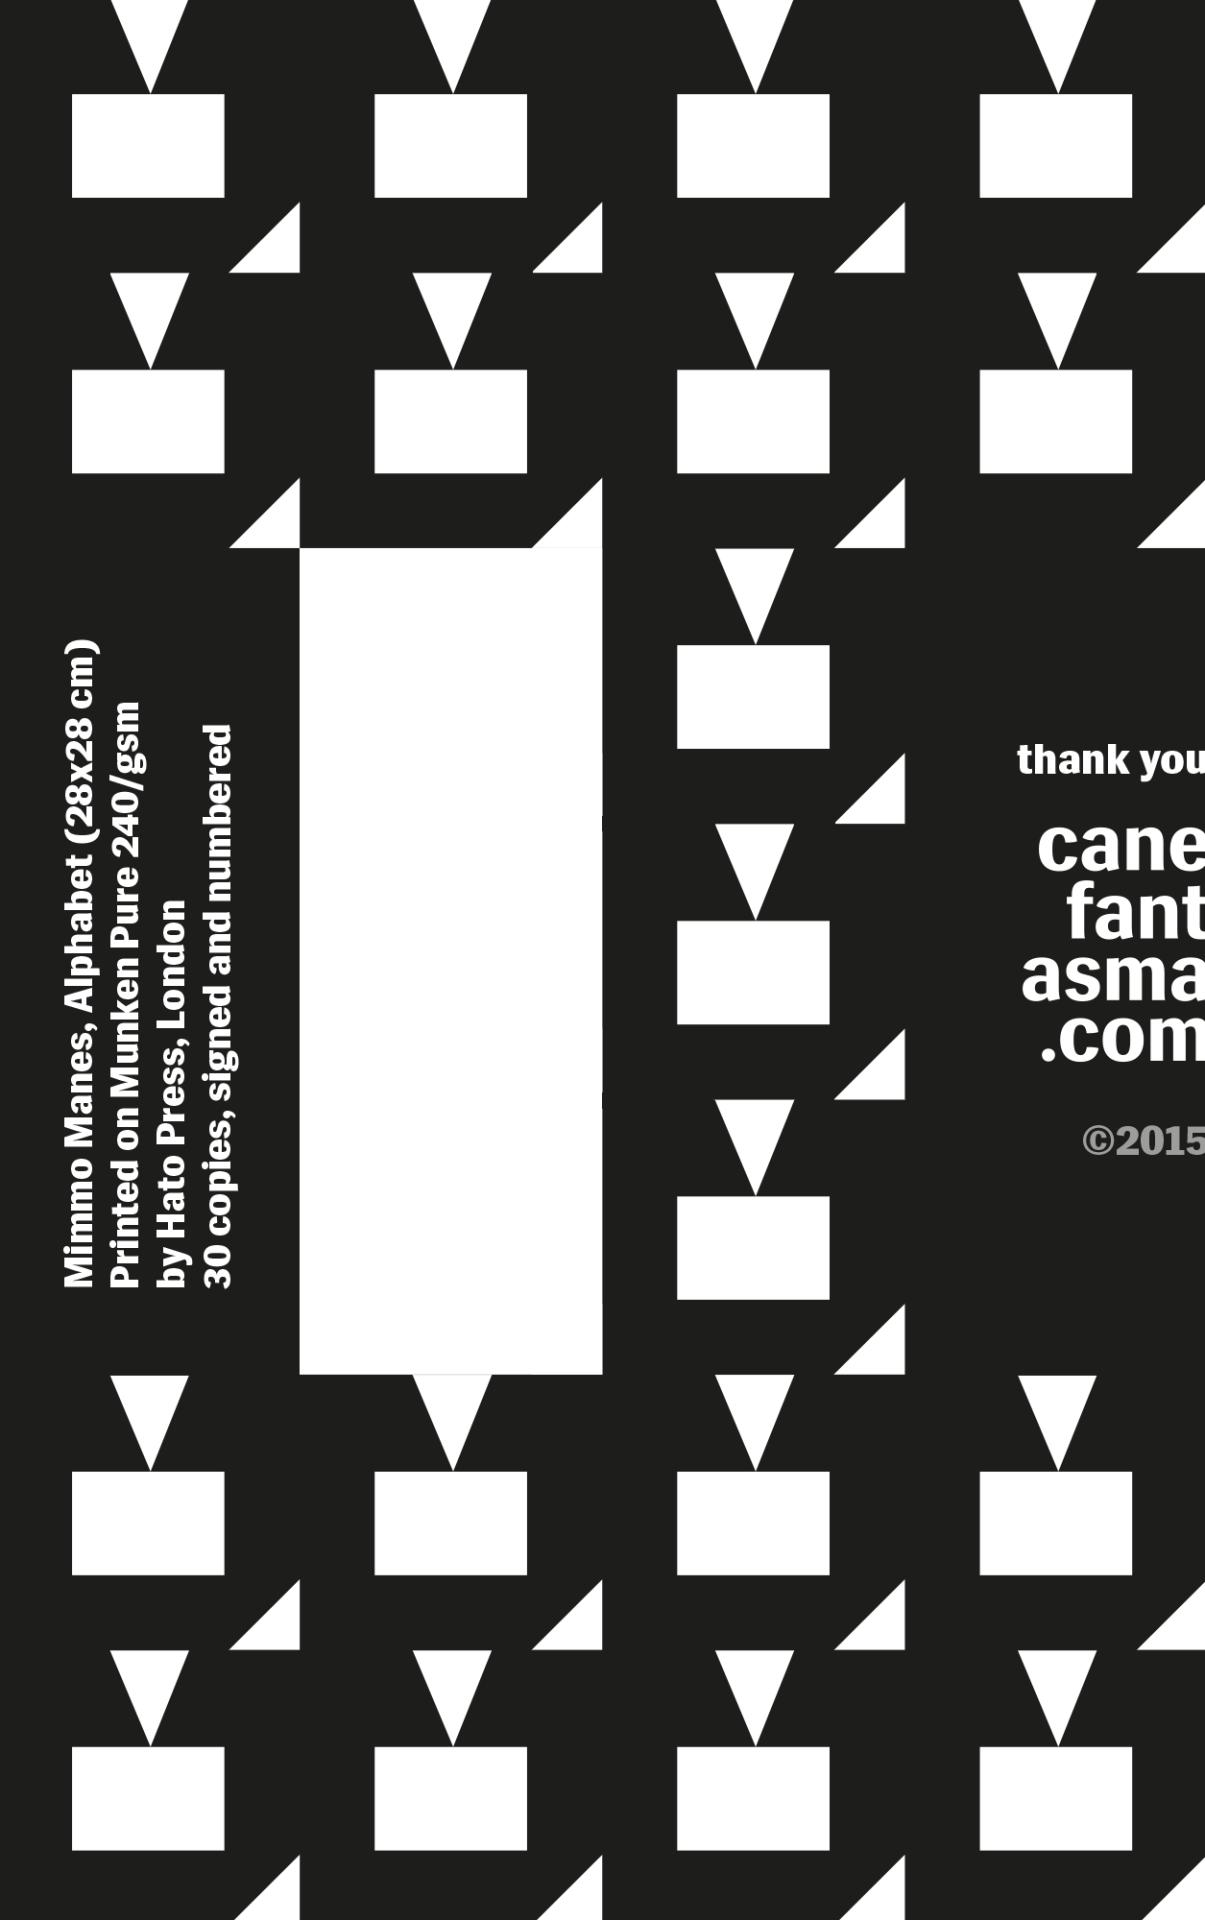 Canefantasma, Certificate of Authenticity